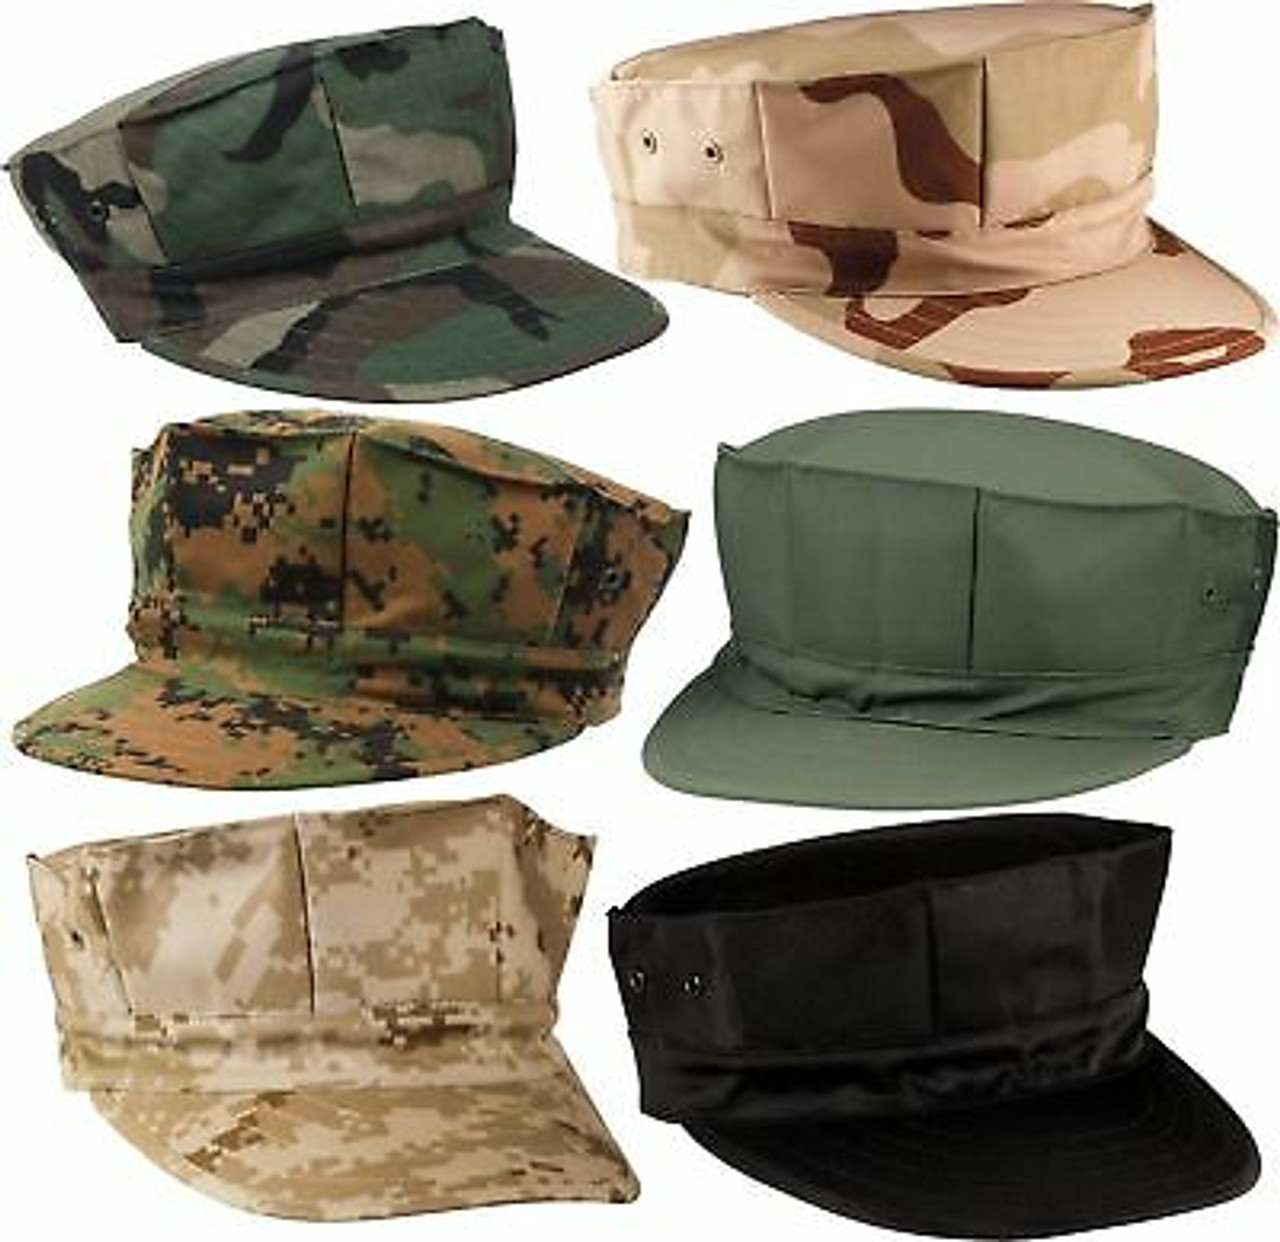 Marines Military Fatigue Hat BDU Cap 8 Point USMC Utility Cover Uniform Camo